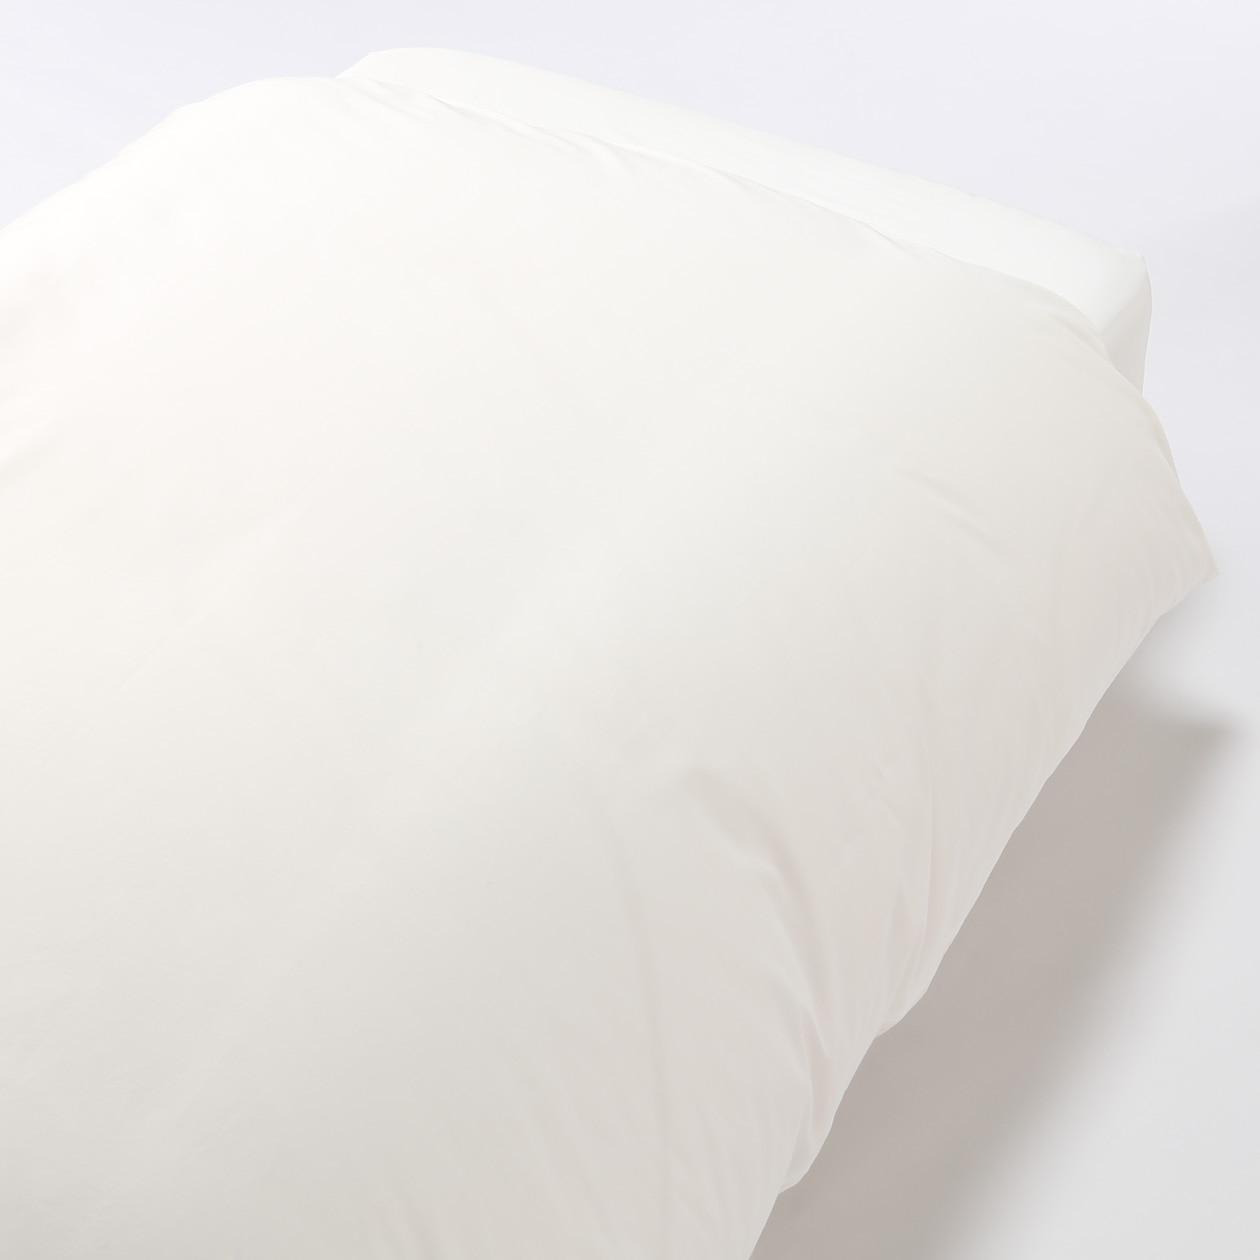 RoomClip商品情報 - オーガニックコットン高密度織掛ふとんカバー・Q/オフ白 Q/オフ白